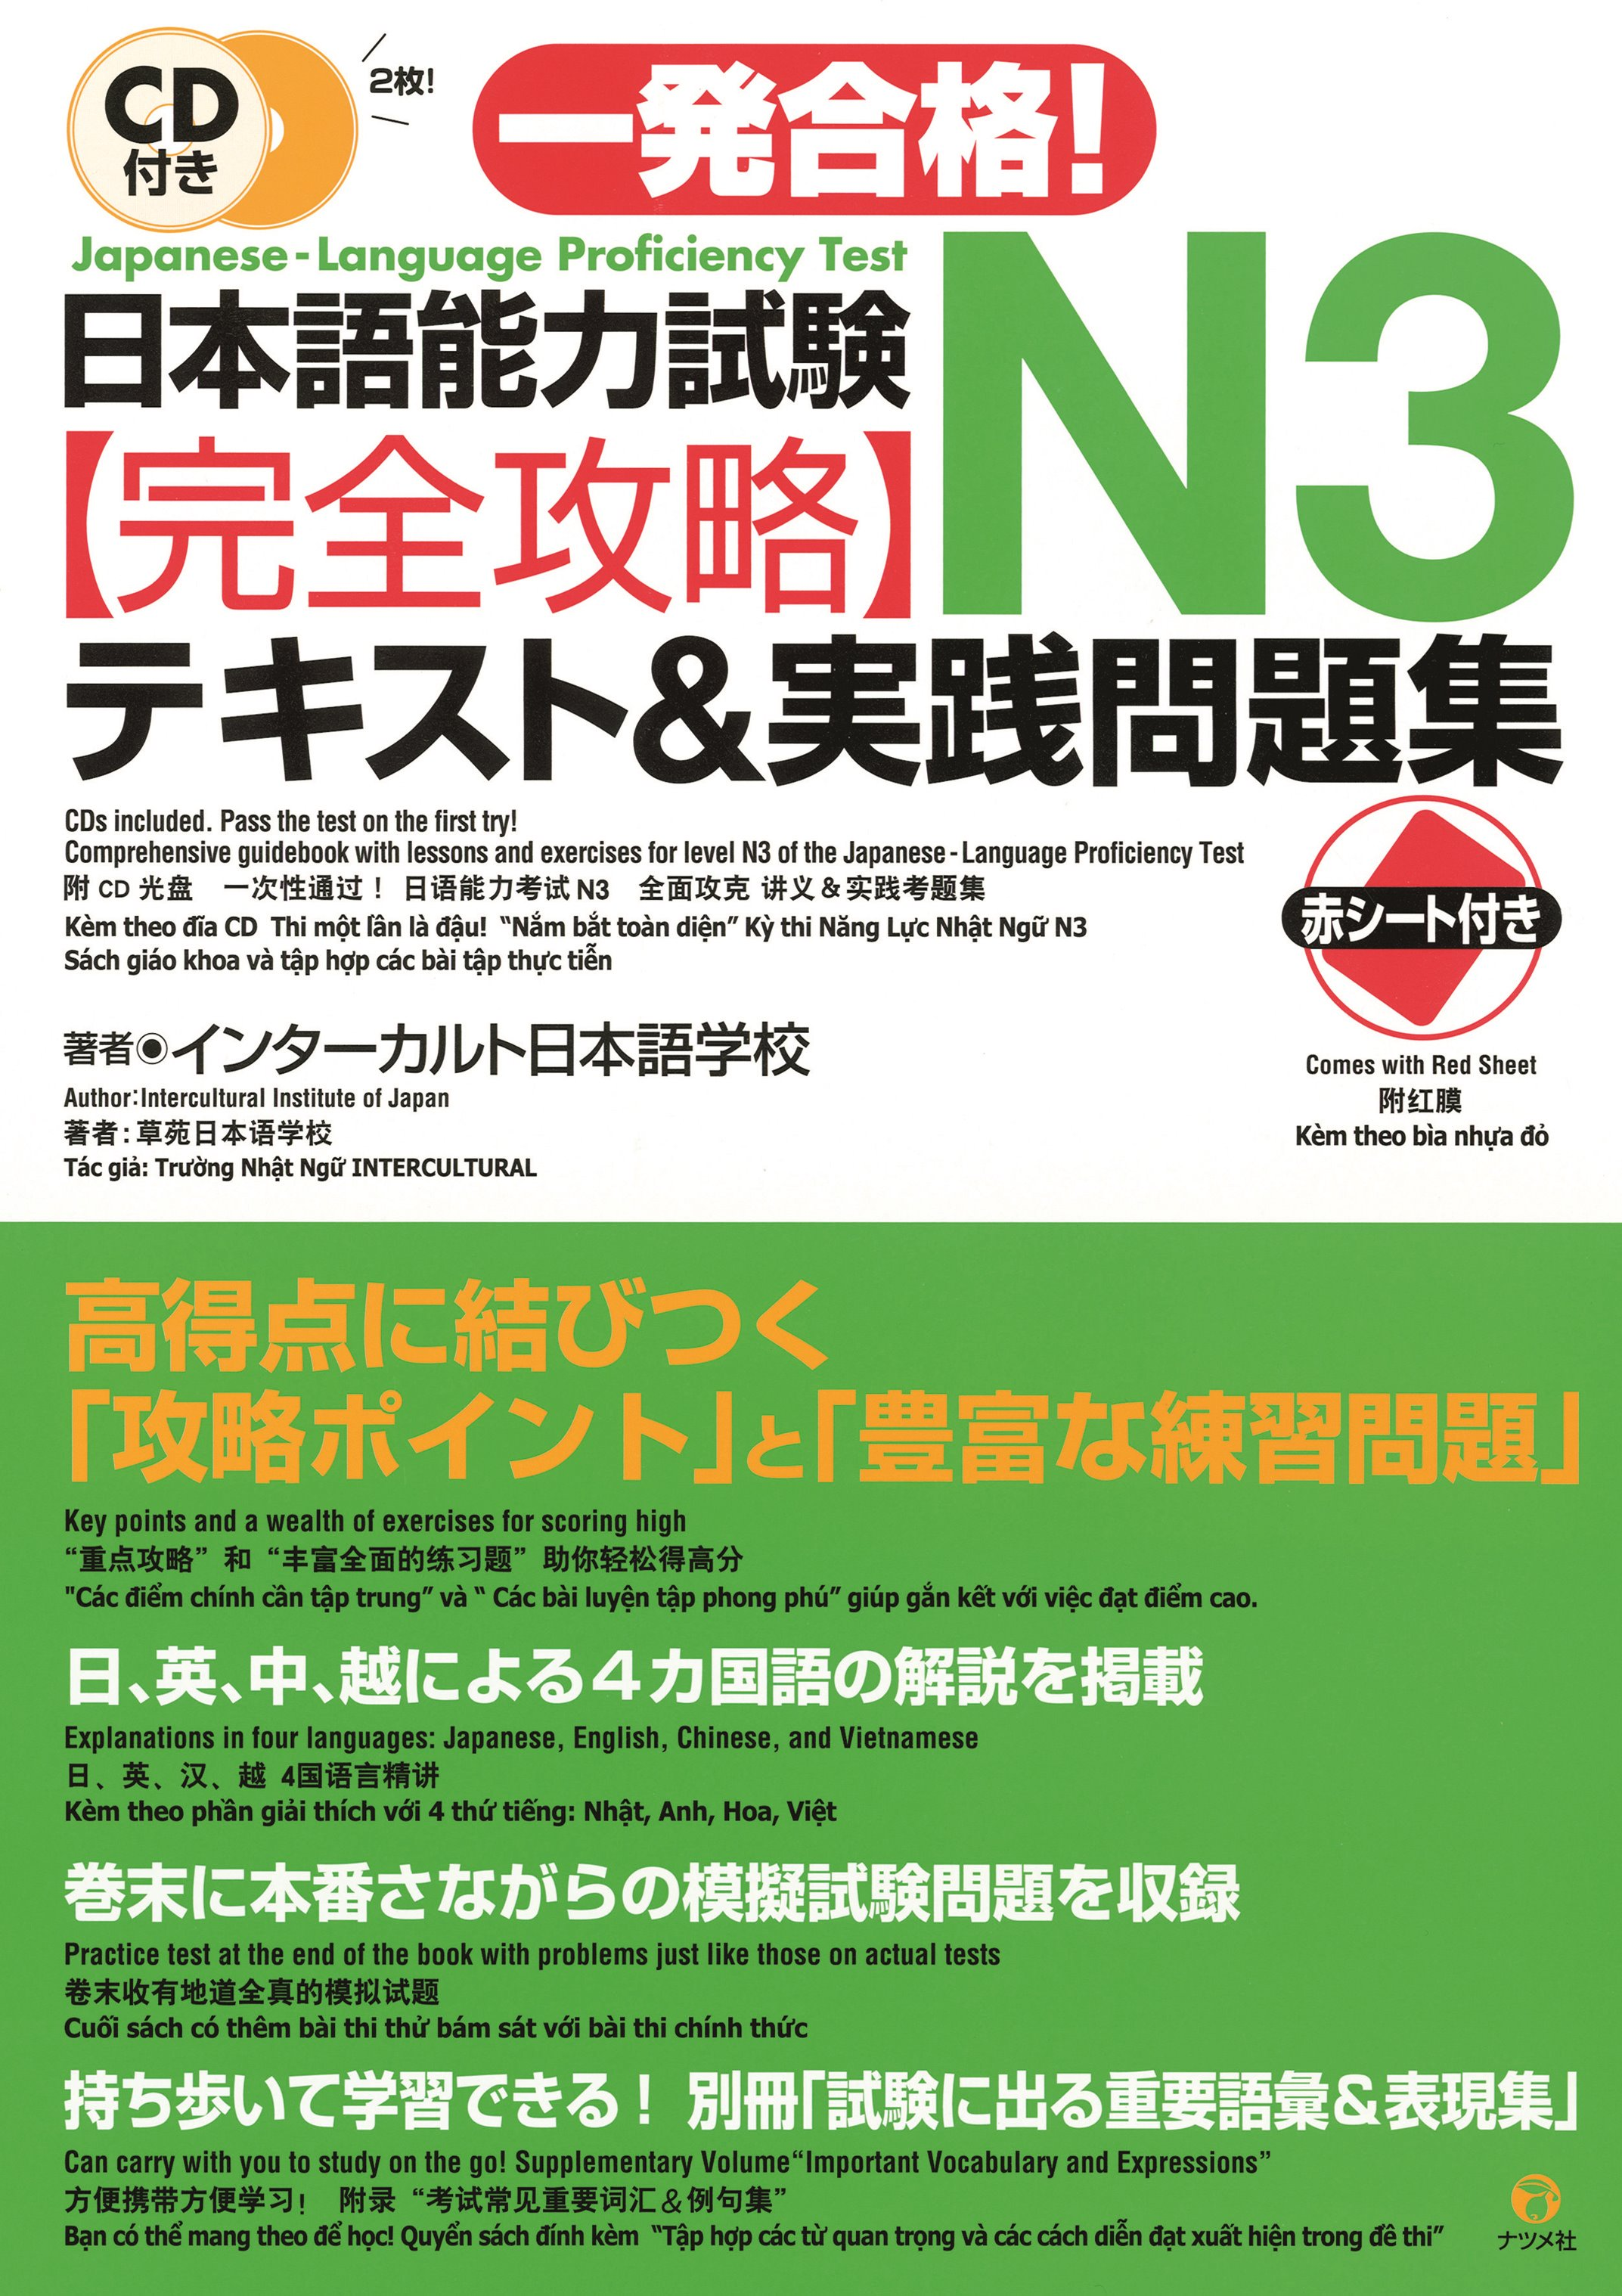 CD付き一発合格!日本語能力試験N3完全攻略テキスト&実践問題集 画像